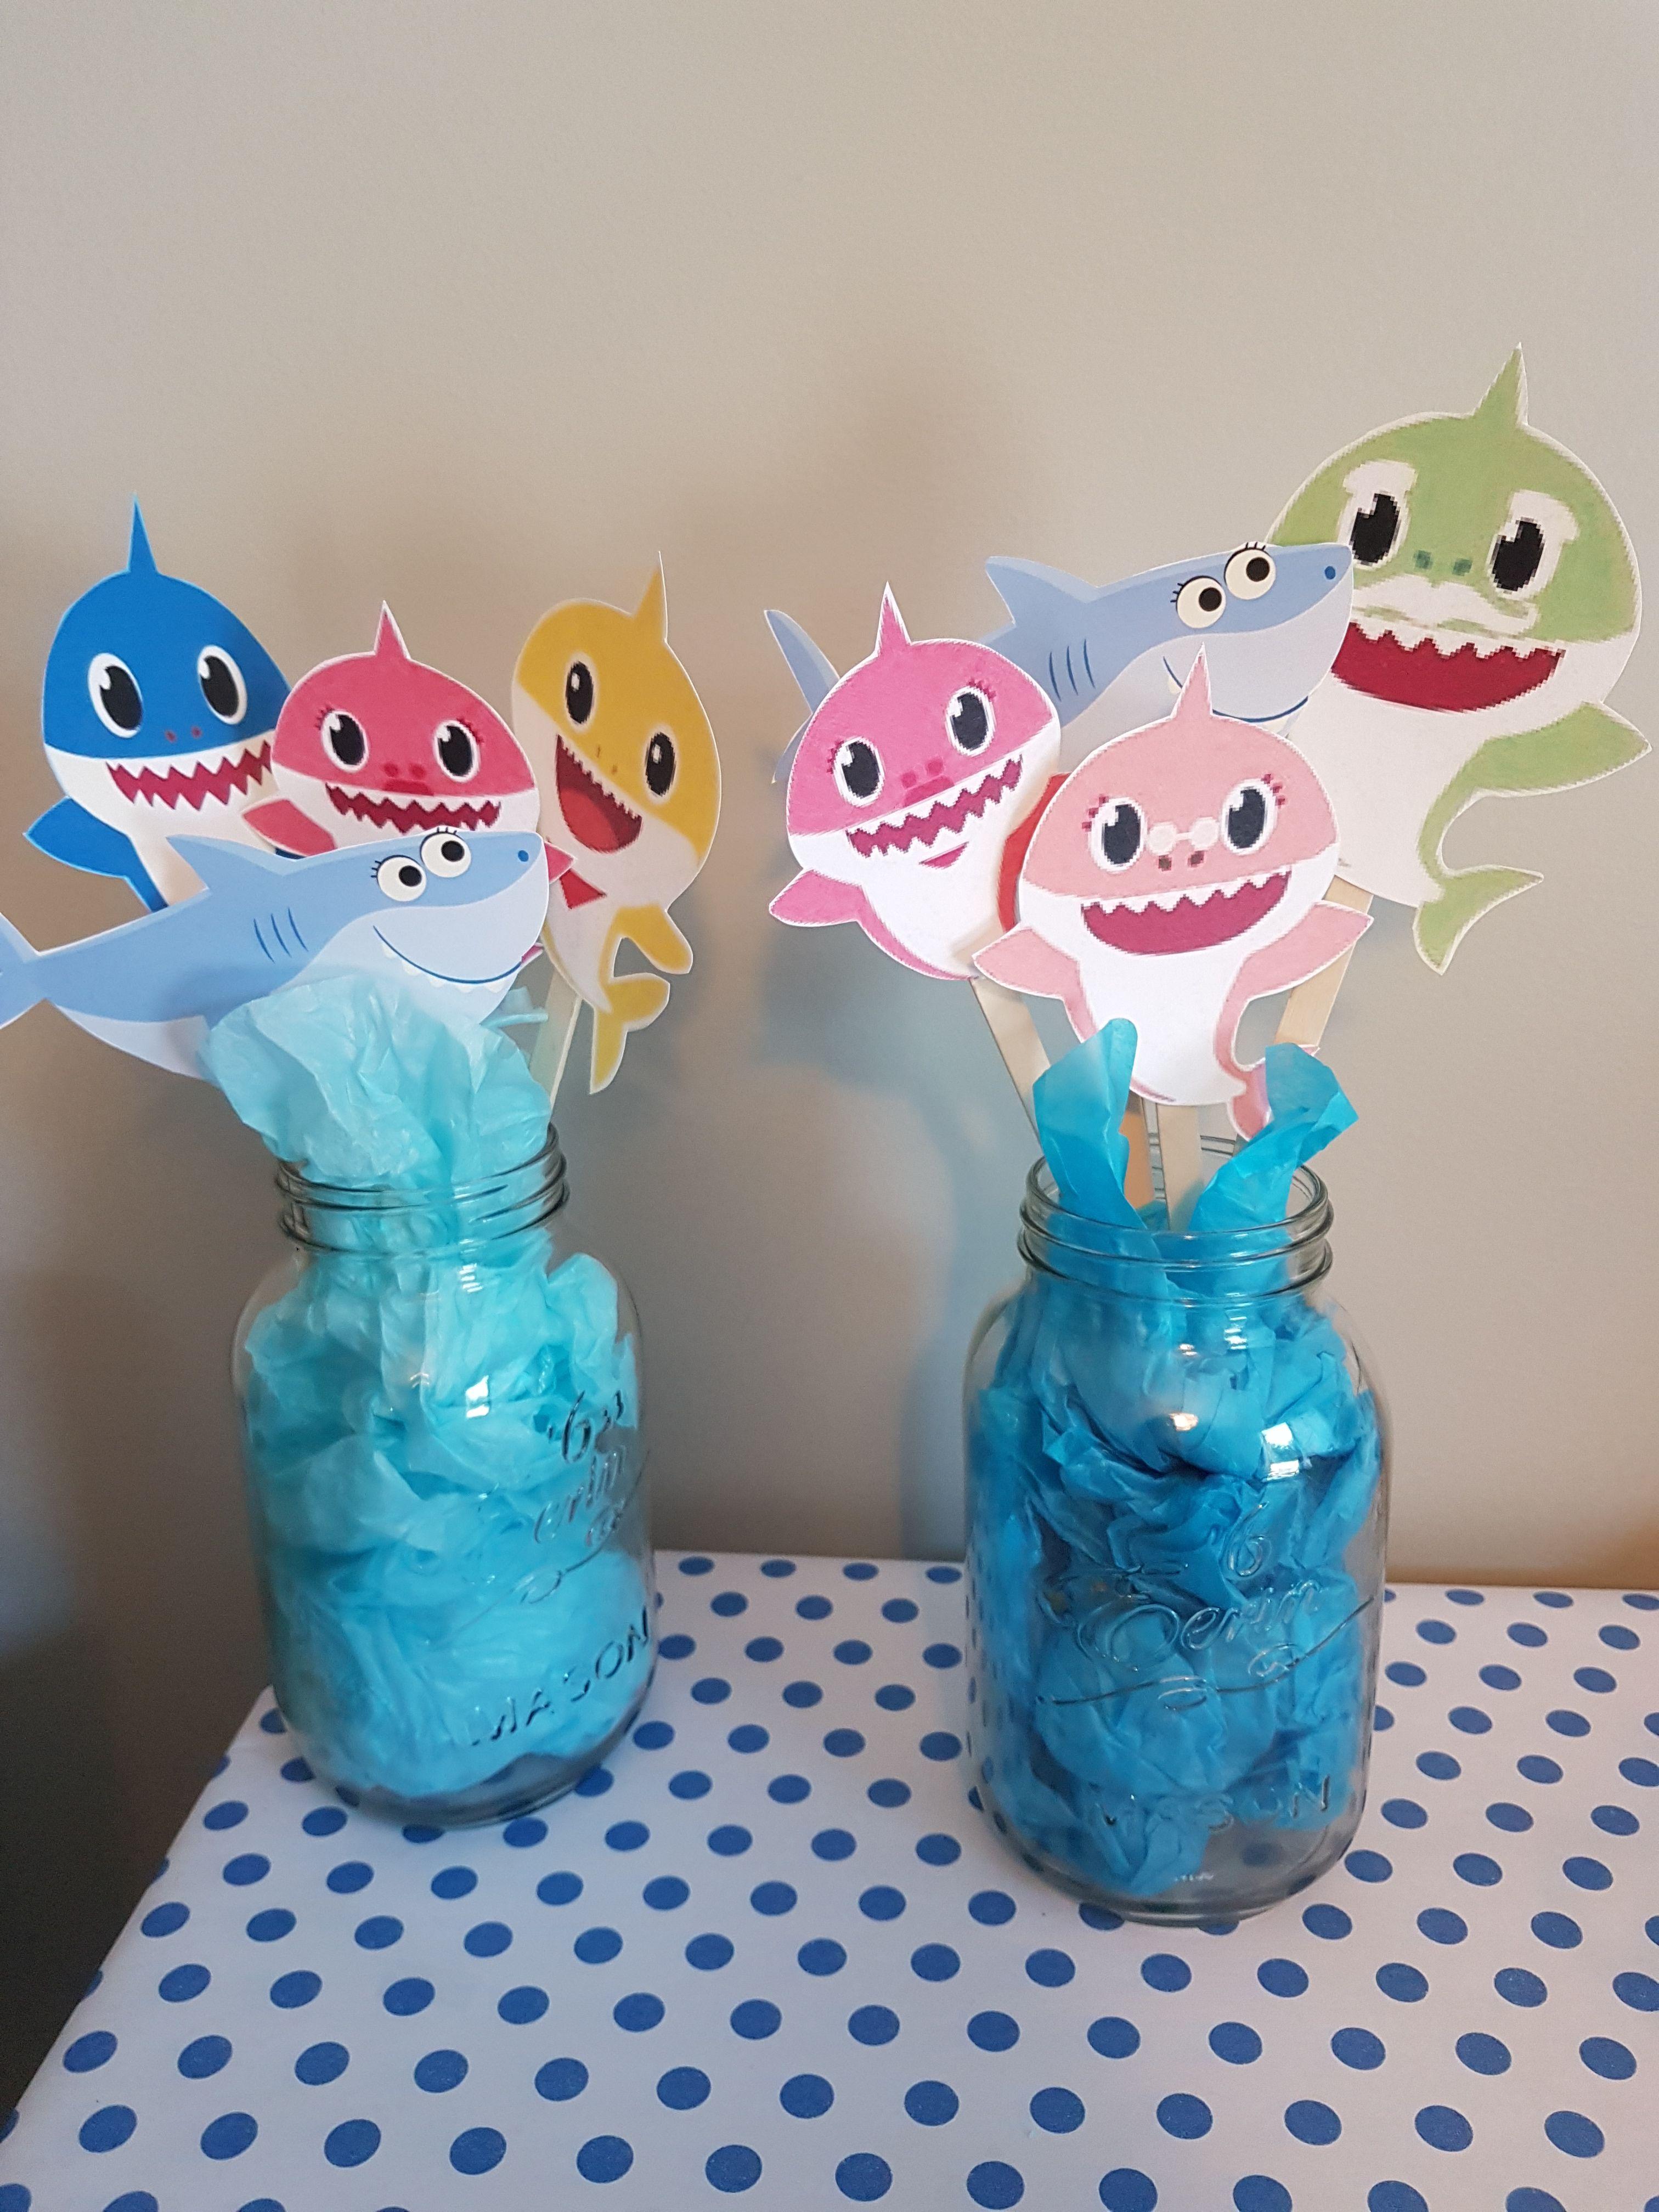 Baby Shark Party Diy Decor Shark Party Decorations Birthday Party Decorations Diy Diy Party Decorations